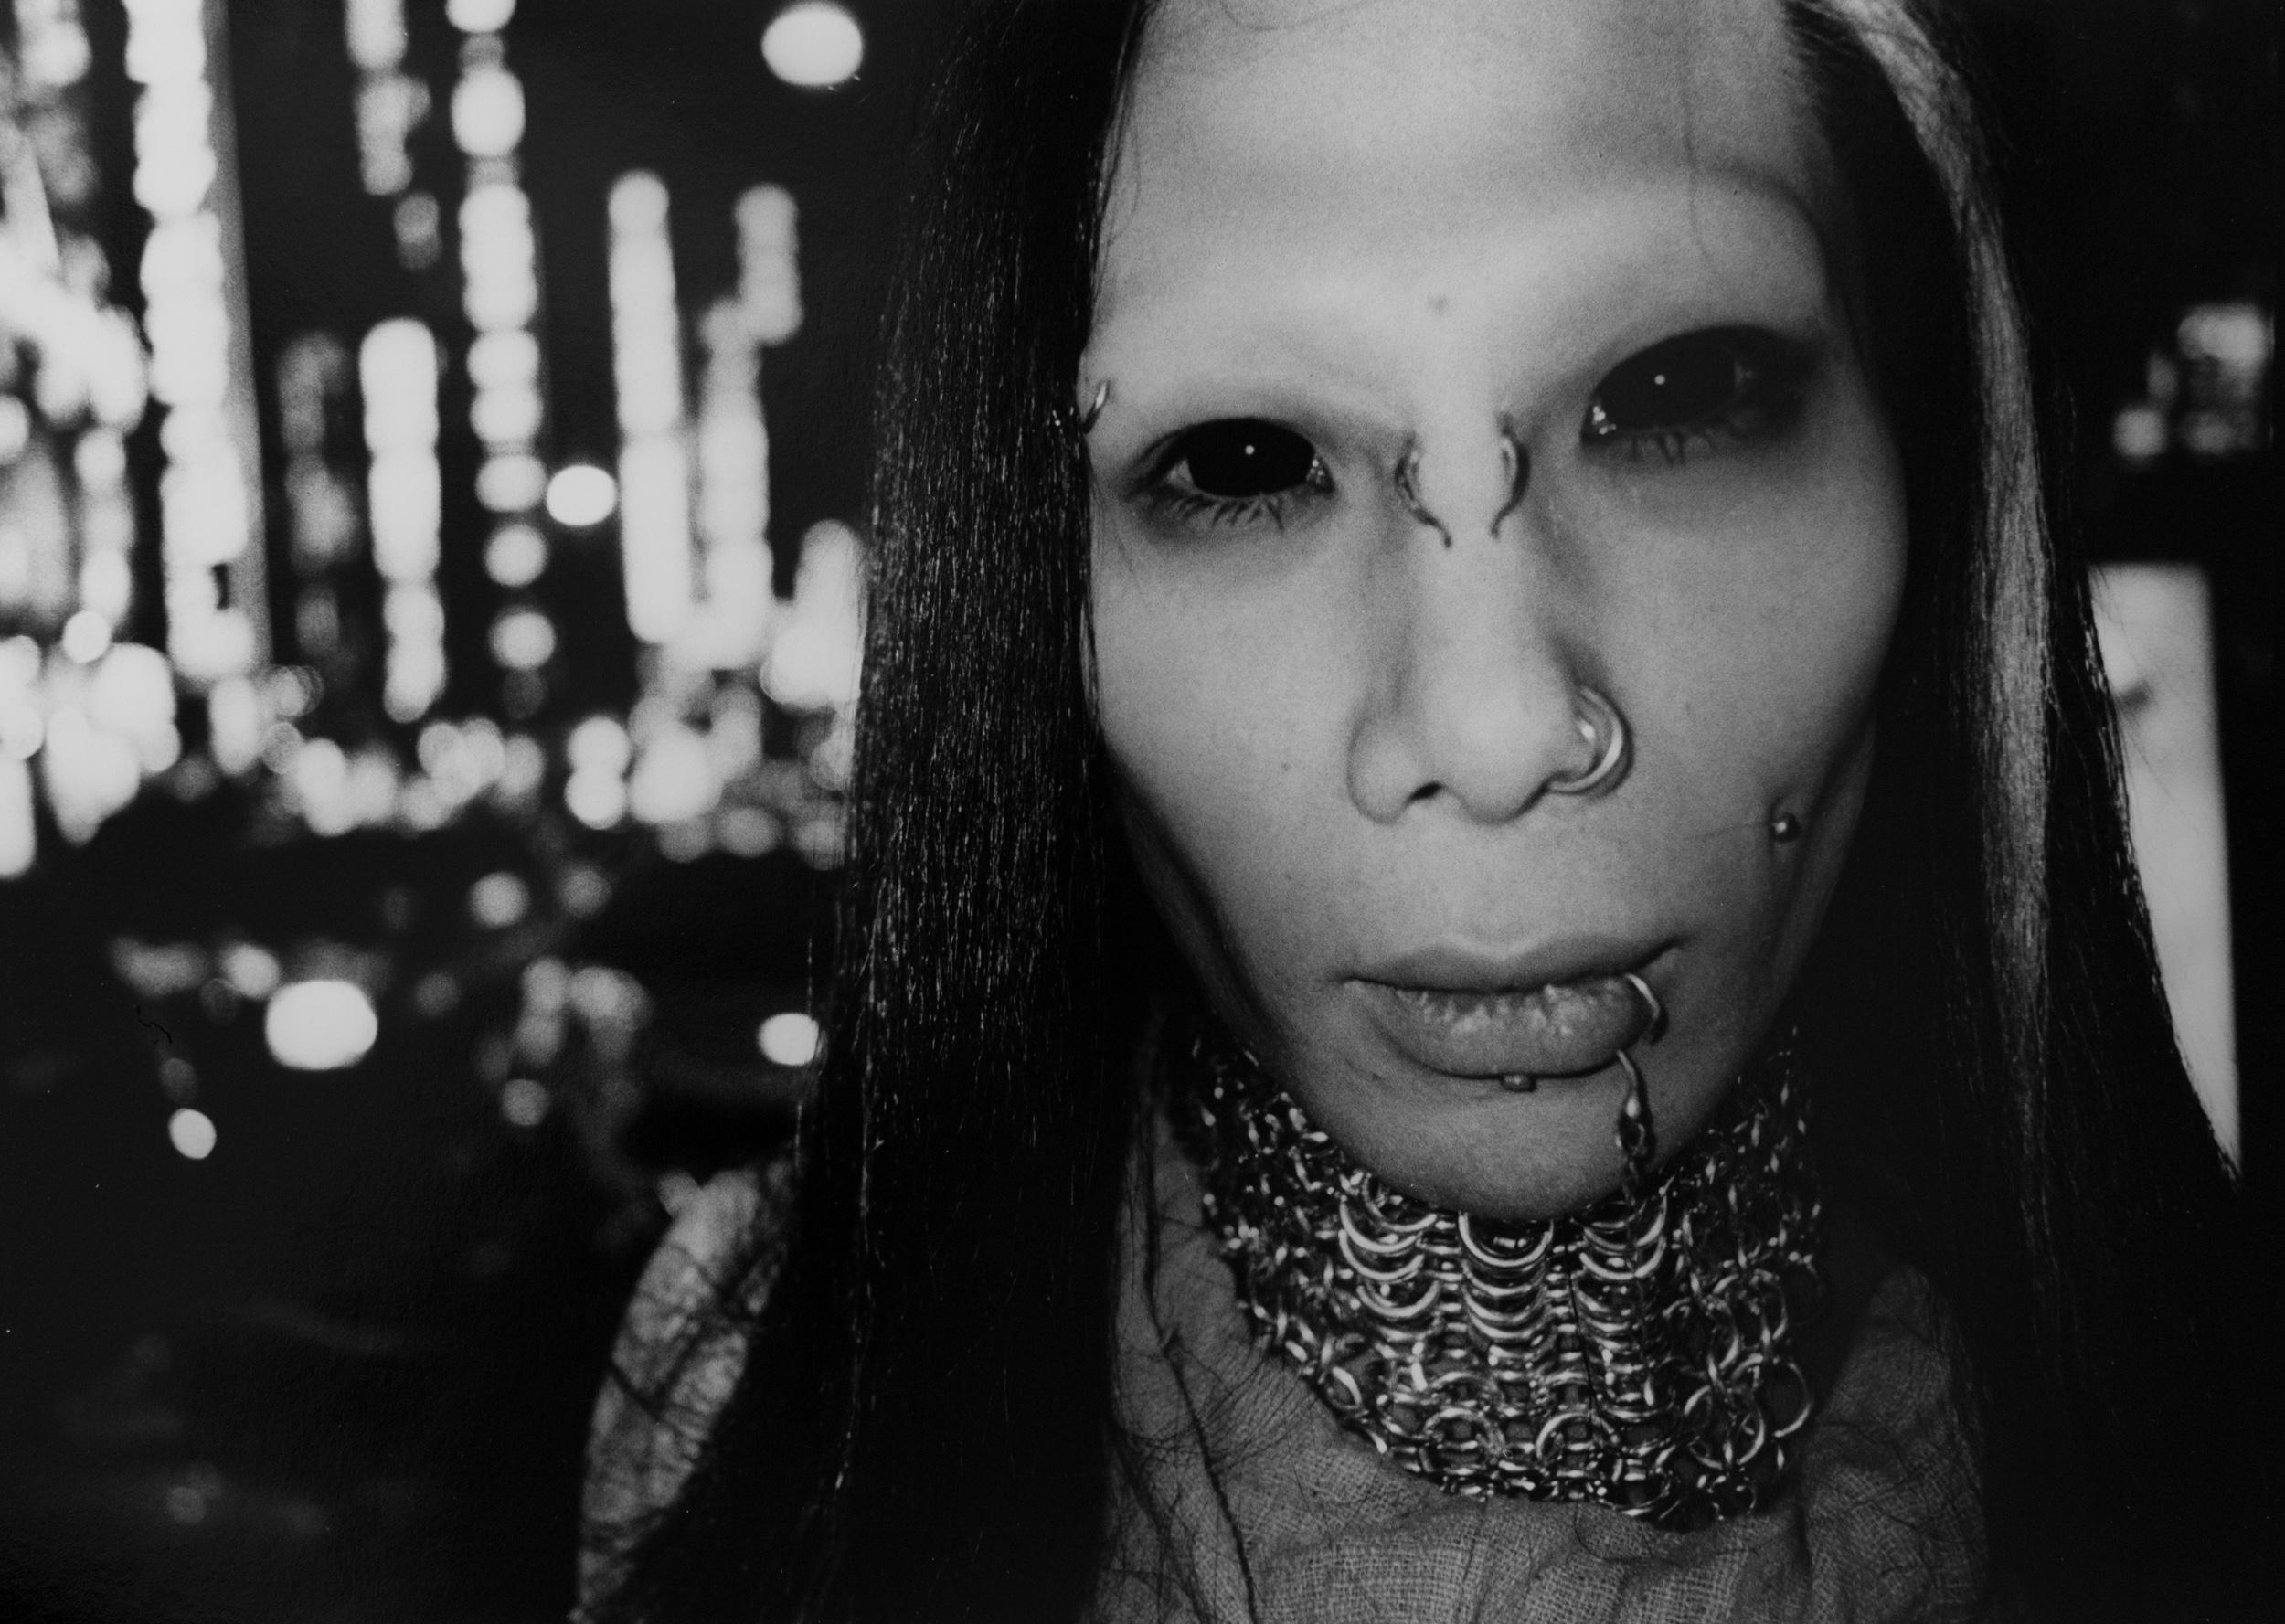 Daido Moriyama and the aesthetics of punk